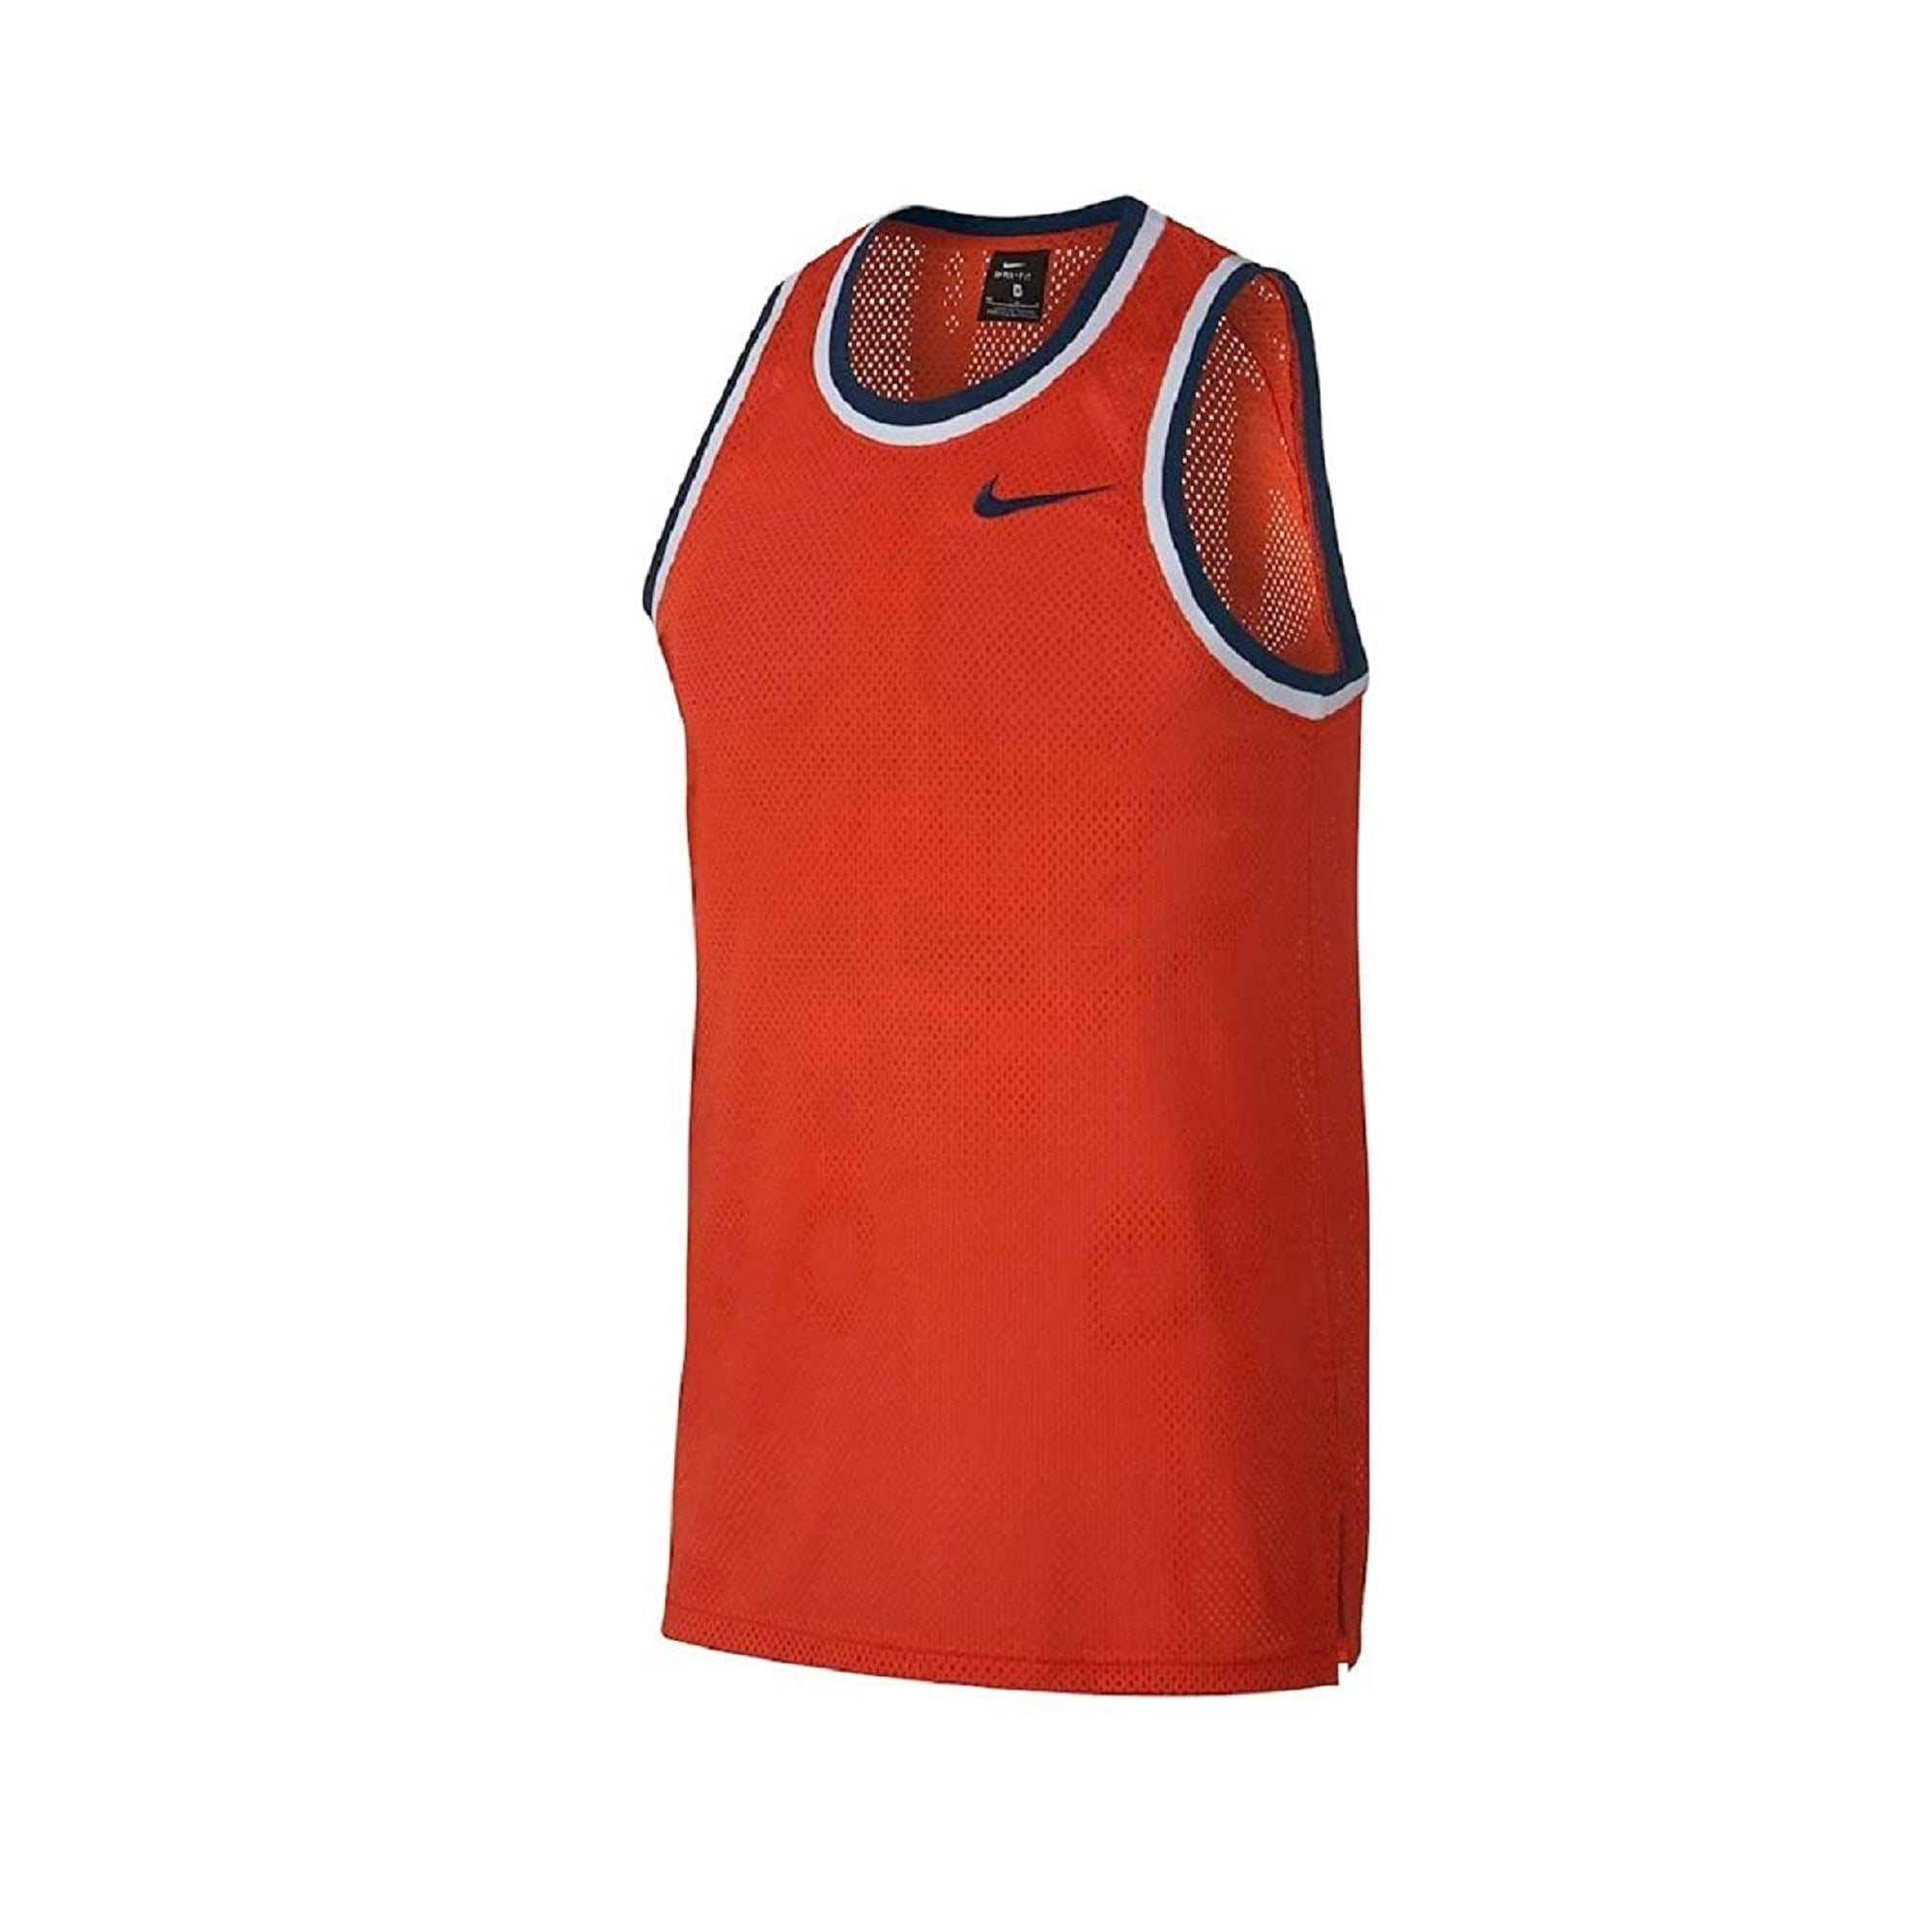 Nike Dri-FIT Classic Men/'s Training Basketball Jersey Dri-FIT Striped Ribbing